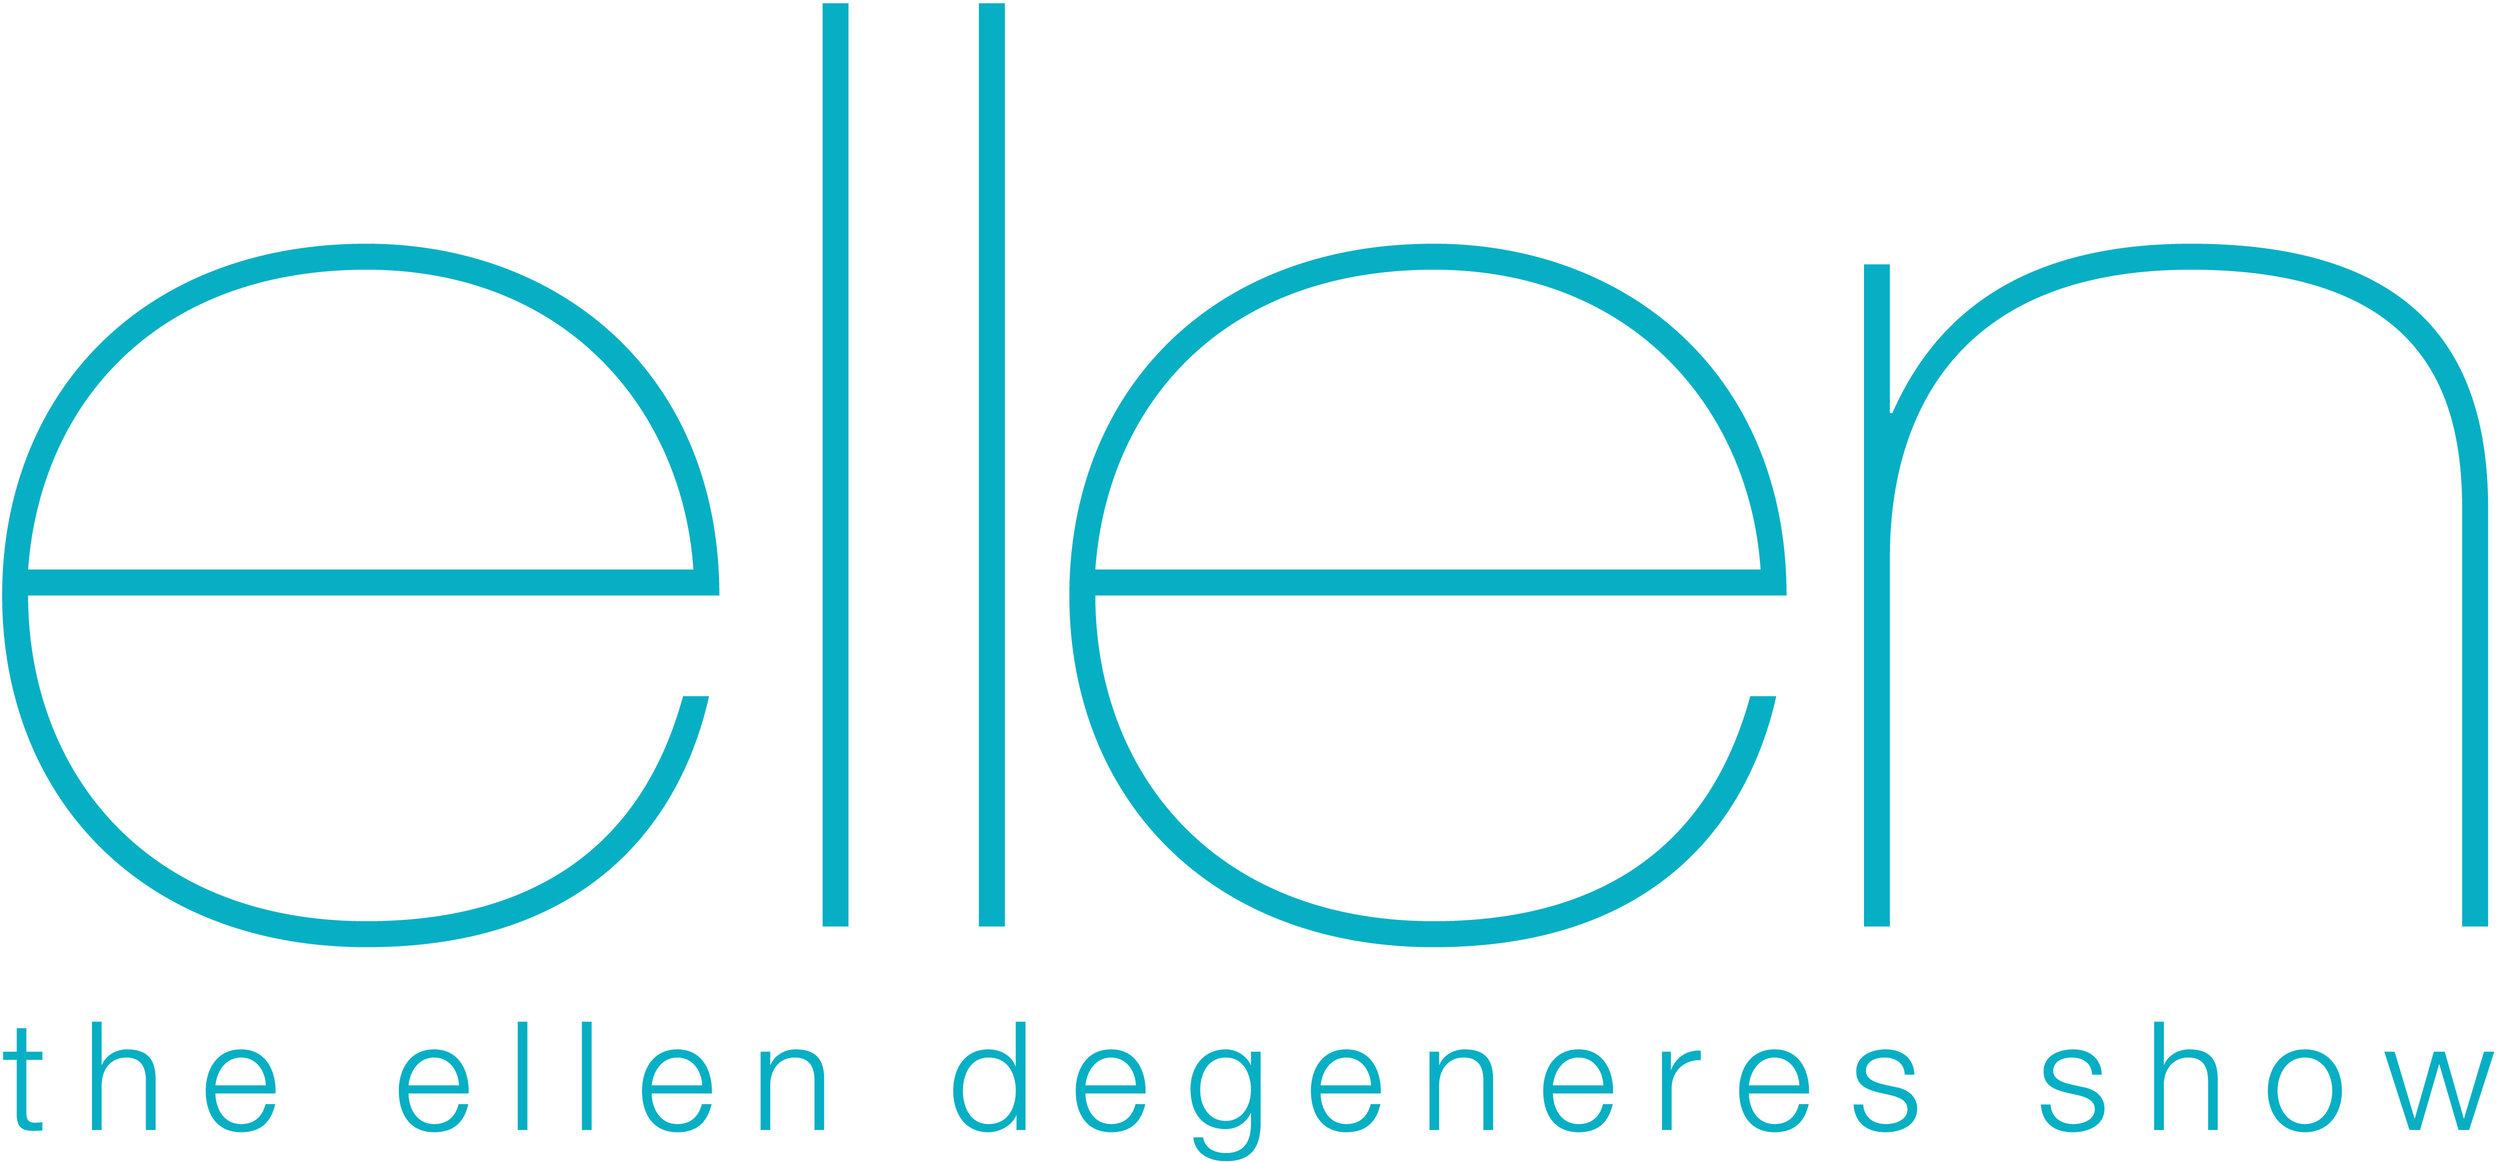 EN_logo-copy.jpg